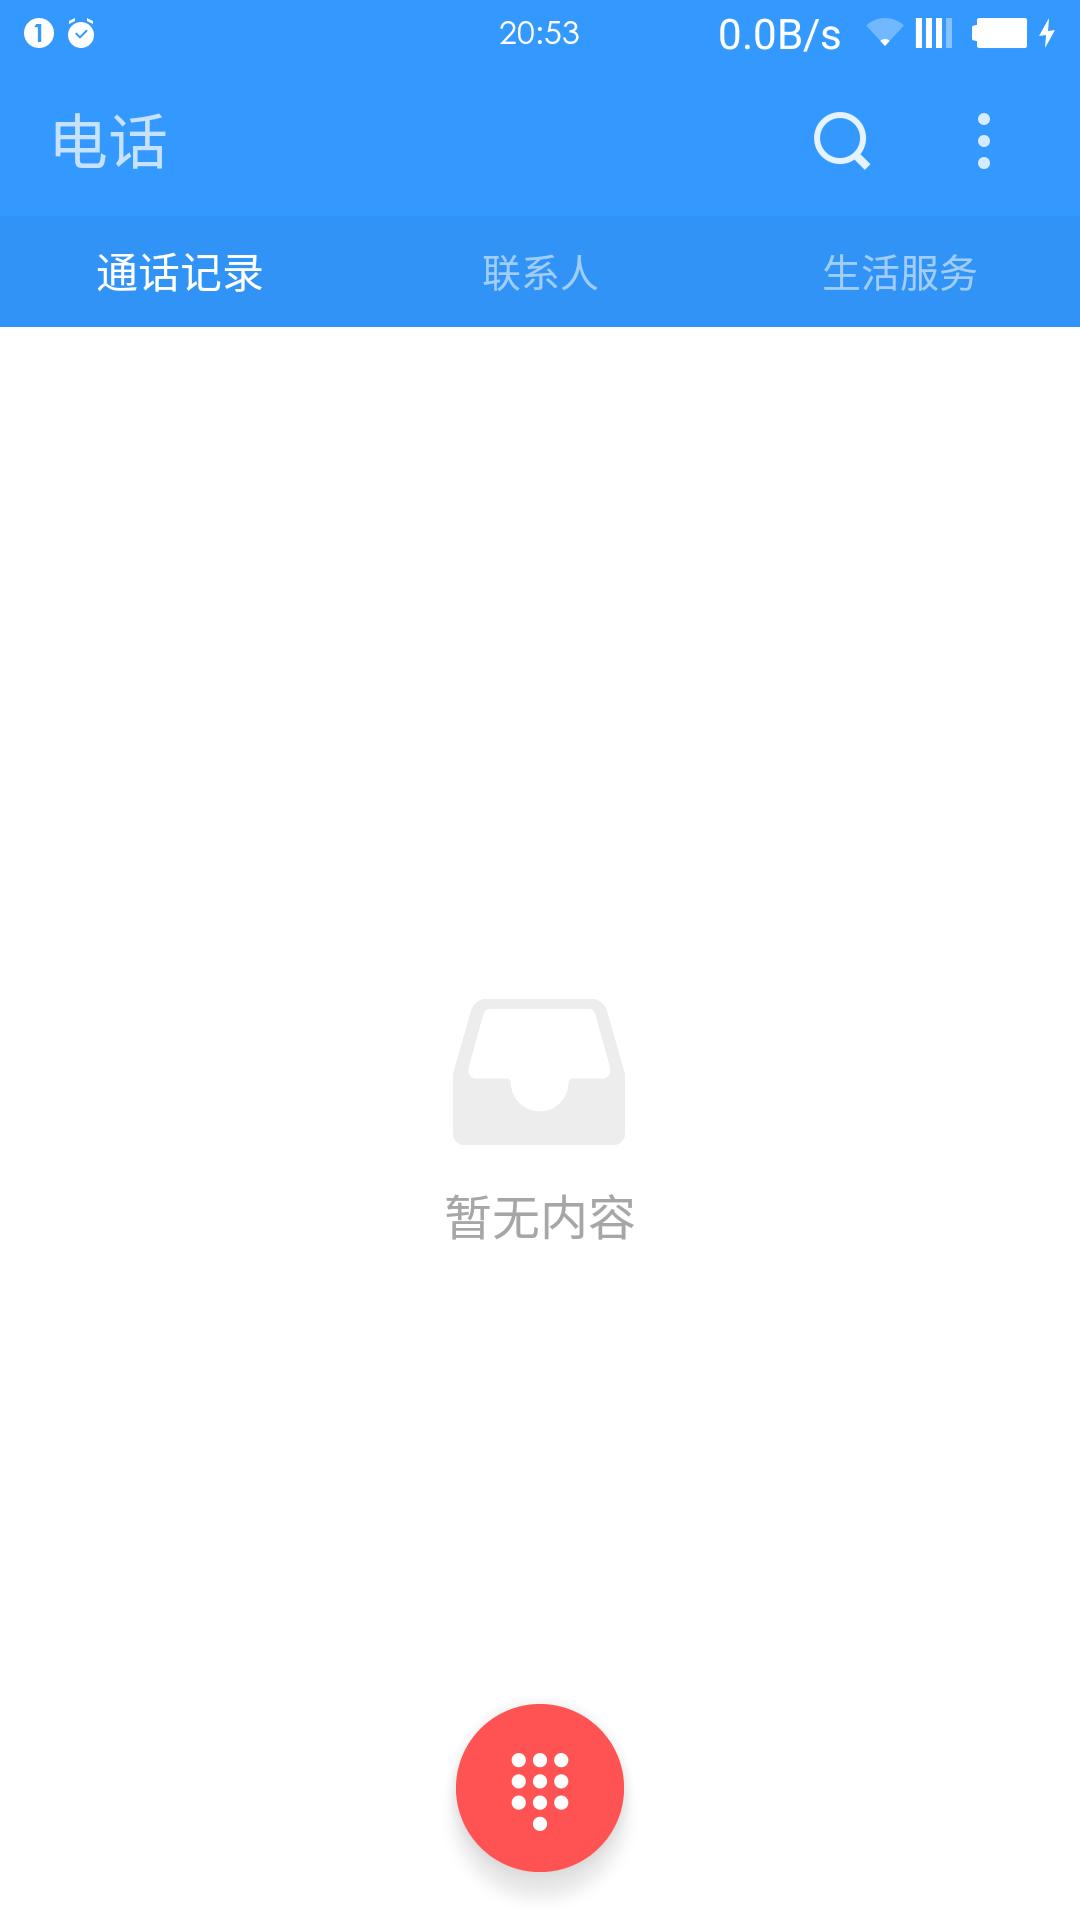 Screenshot_2015-10-16-20-53-11.png